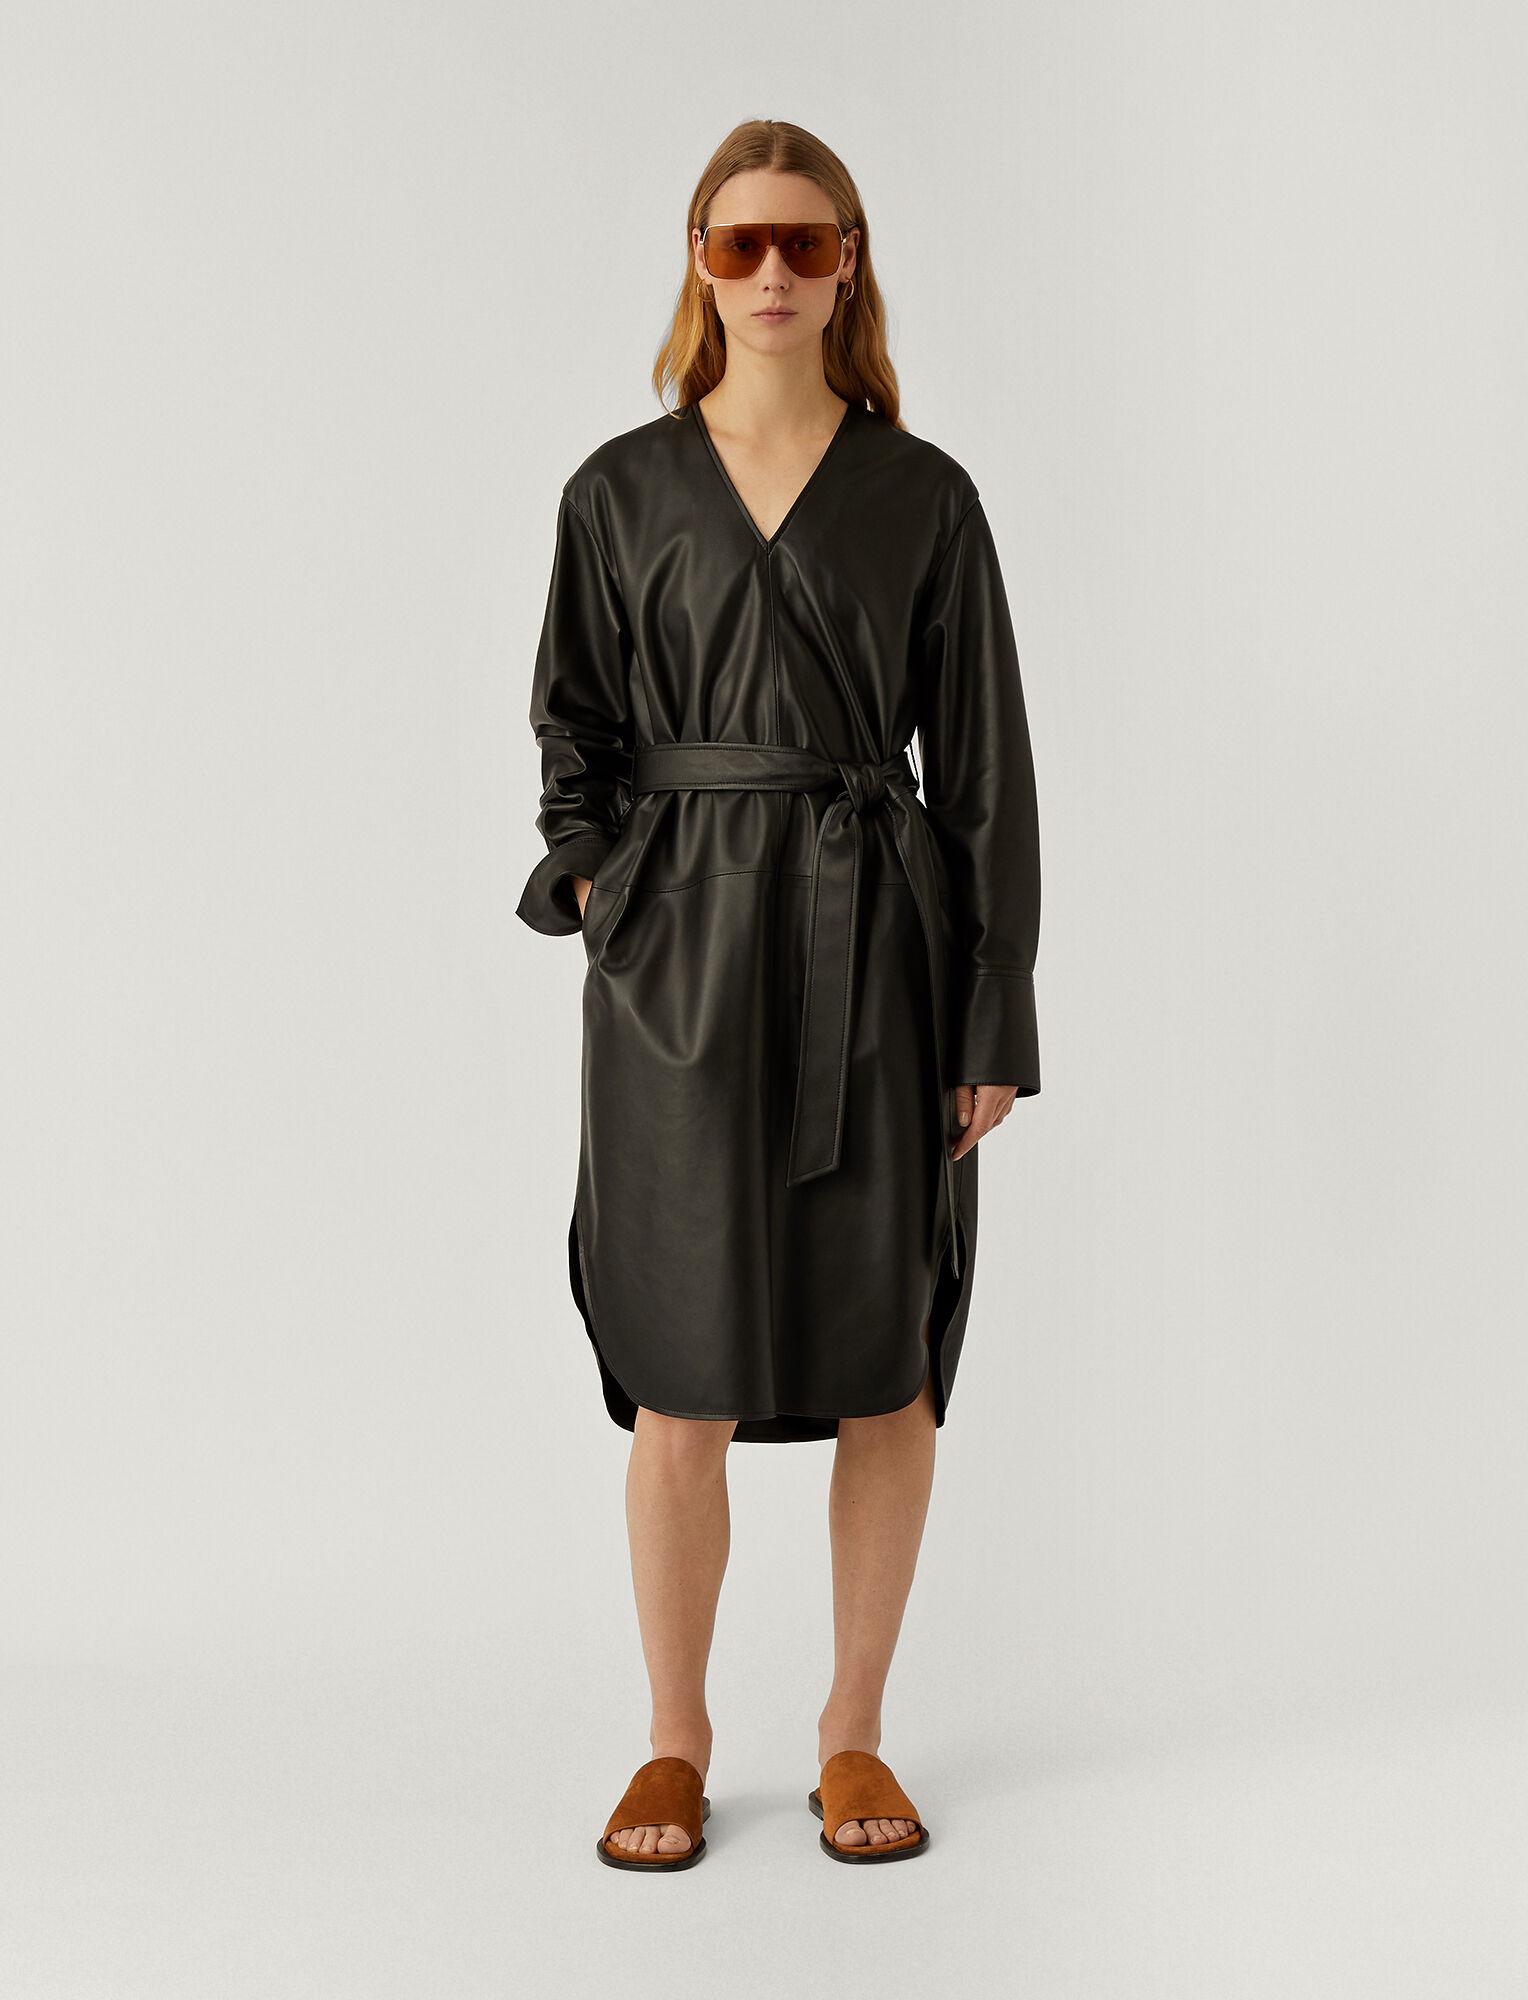 Joseph, Nappa Leather Dahlia Dress, in BLACK